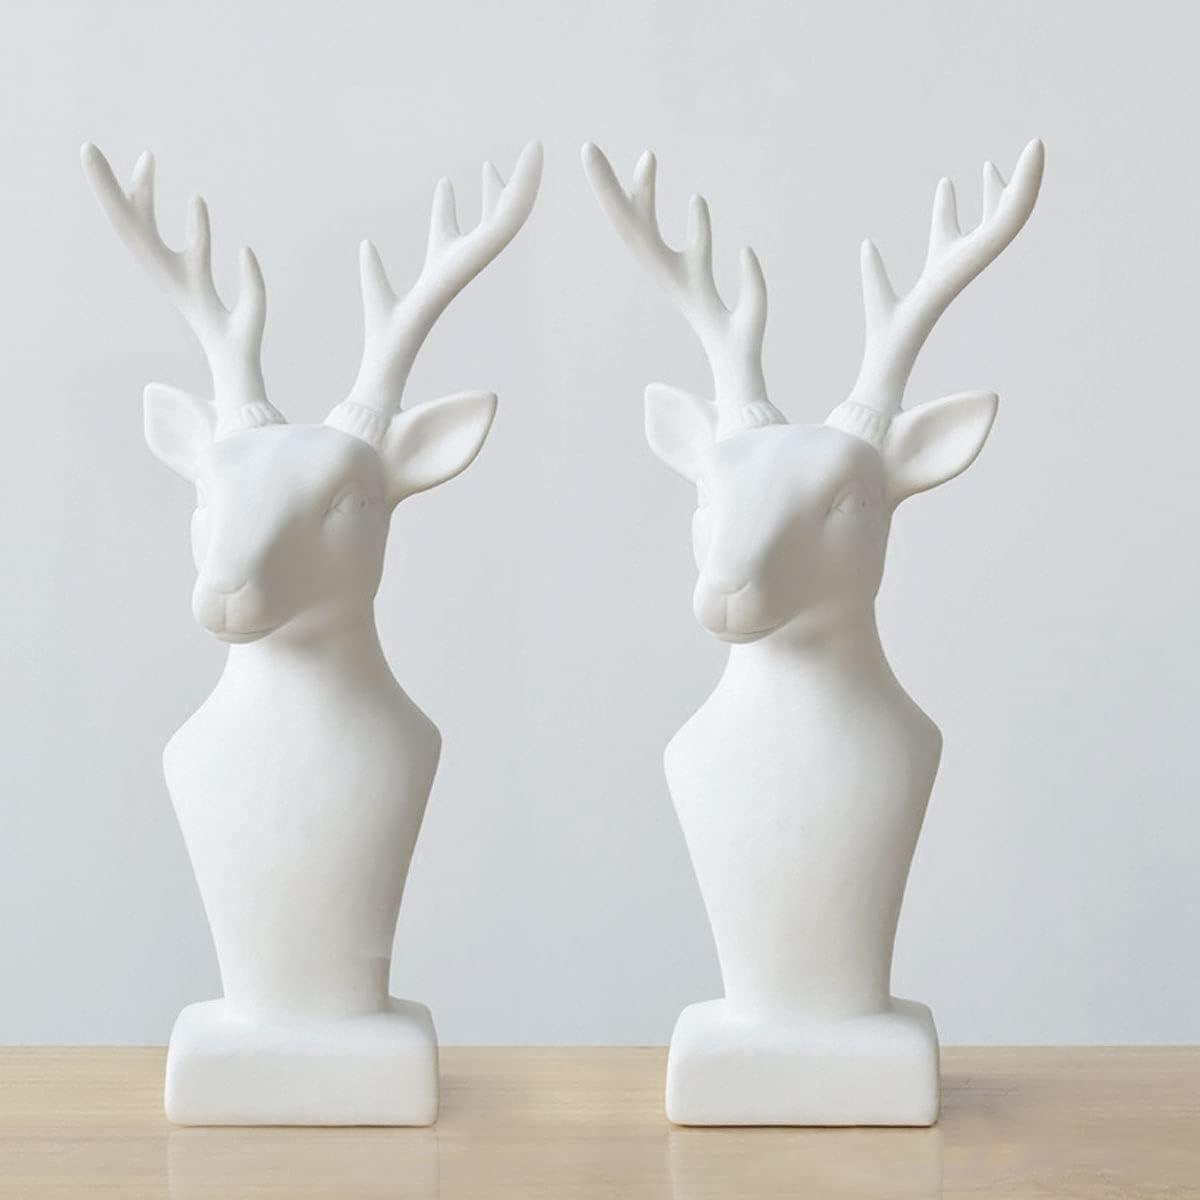 Ceramic Deer Statue, Deer Figurines, Deer Statue Figurines for Home Desk Shelf Decor(Deer/A Set of 2pcs)